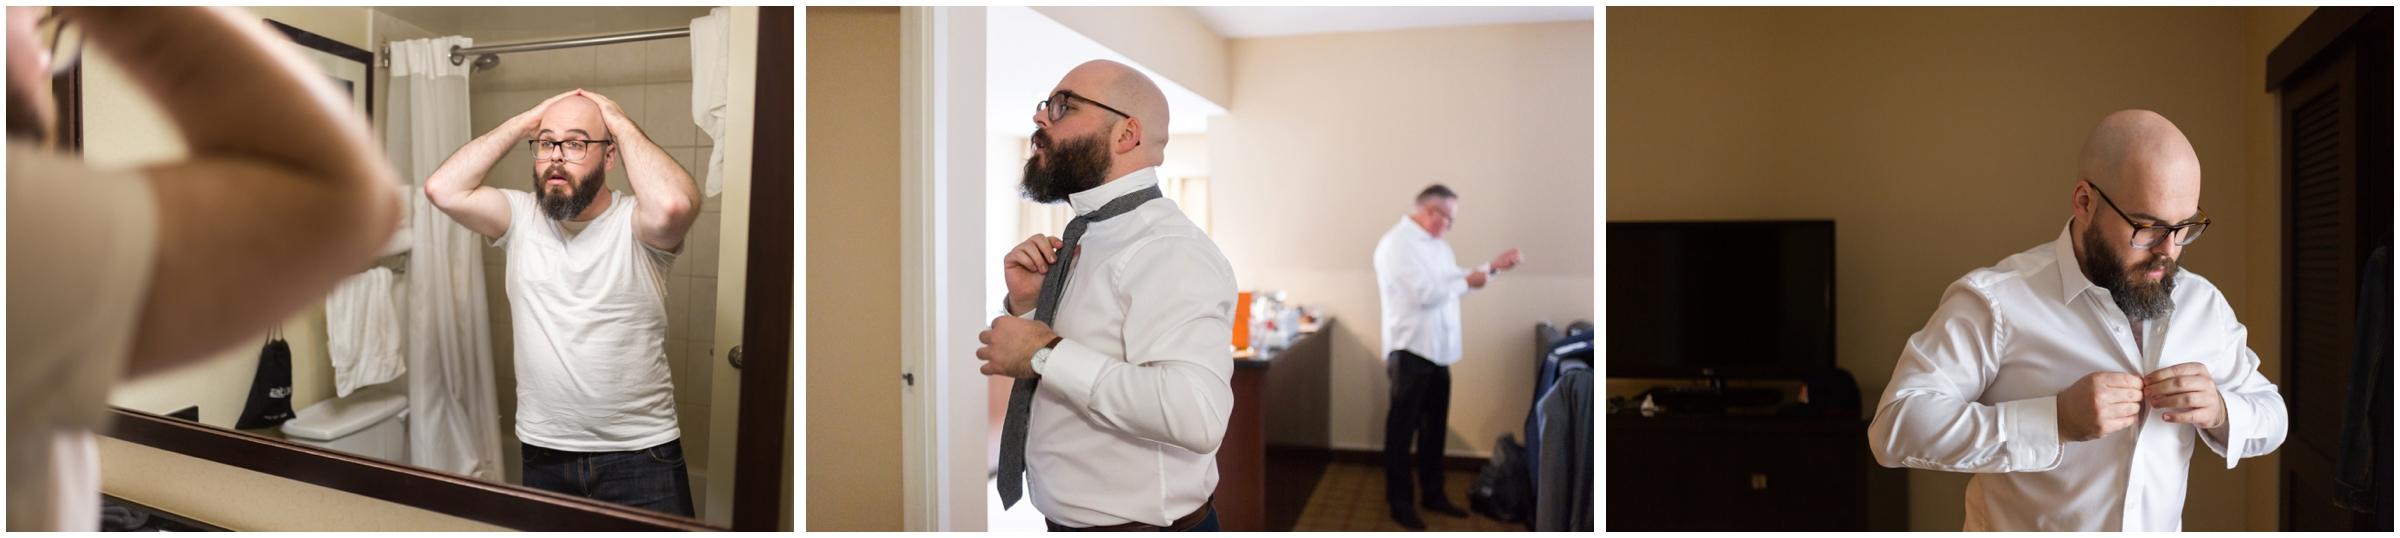 Ottaw Wedding Allison Andrew - (Selena Phillips-Boyle)_0011.jpg